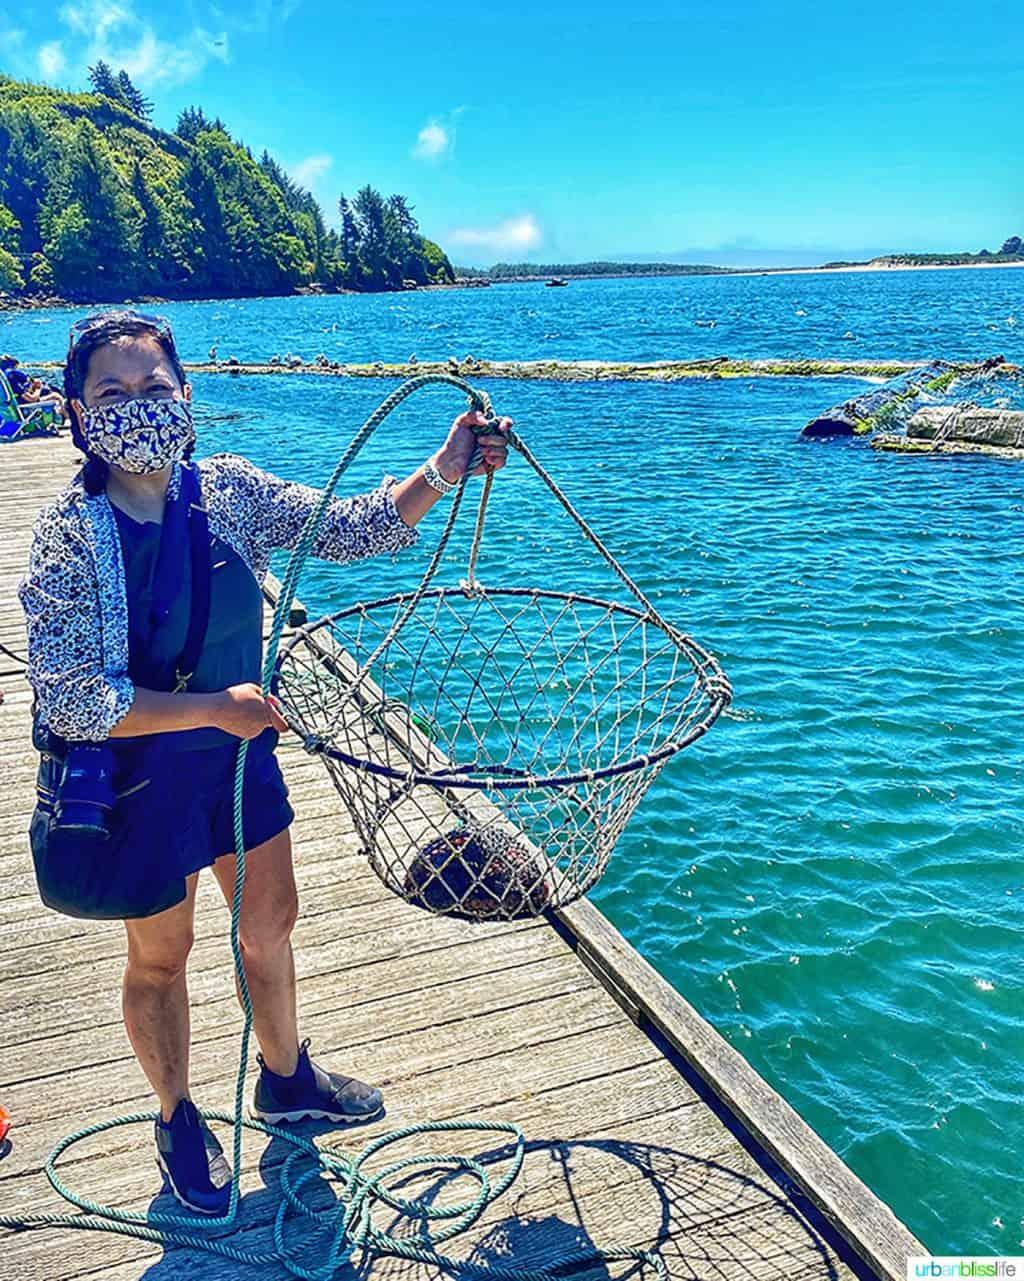 Marlynn Schotland crabbing at Kelly's Brighton Marina in Rockaway, Oregon